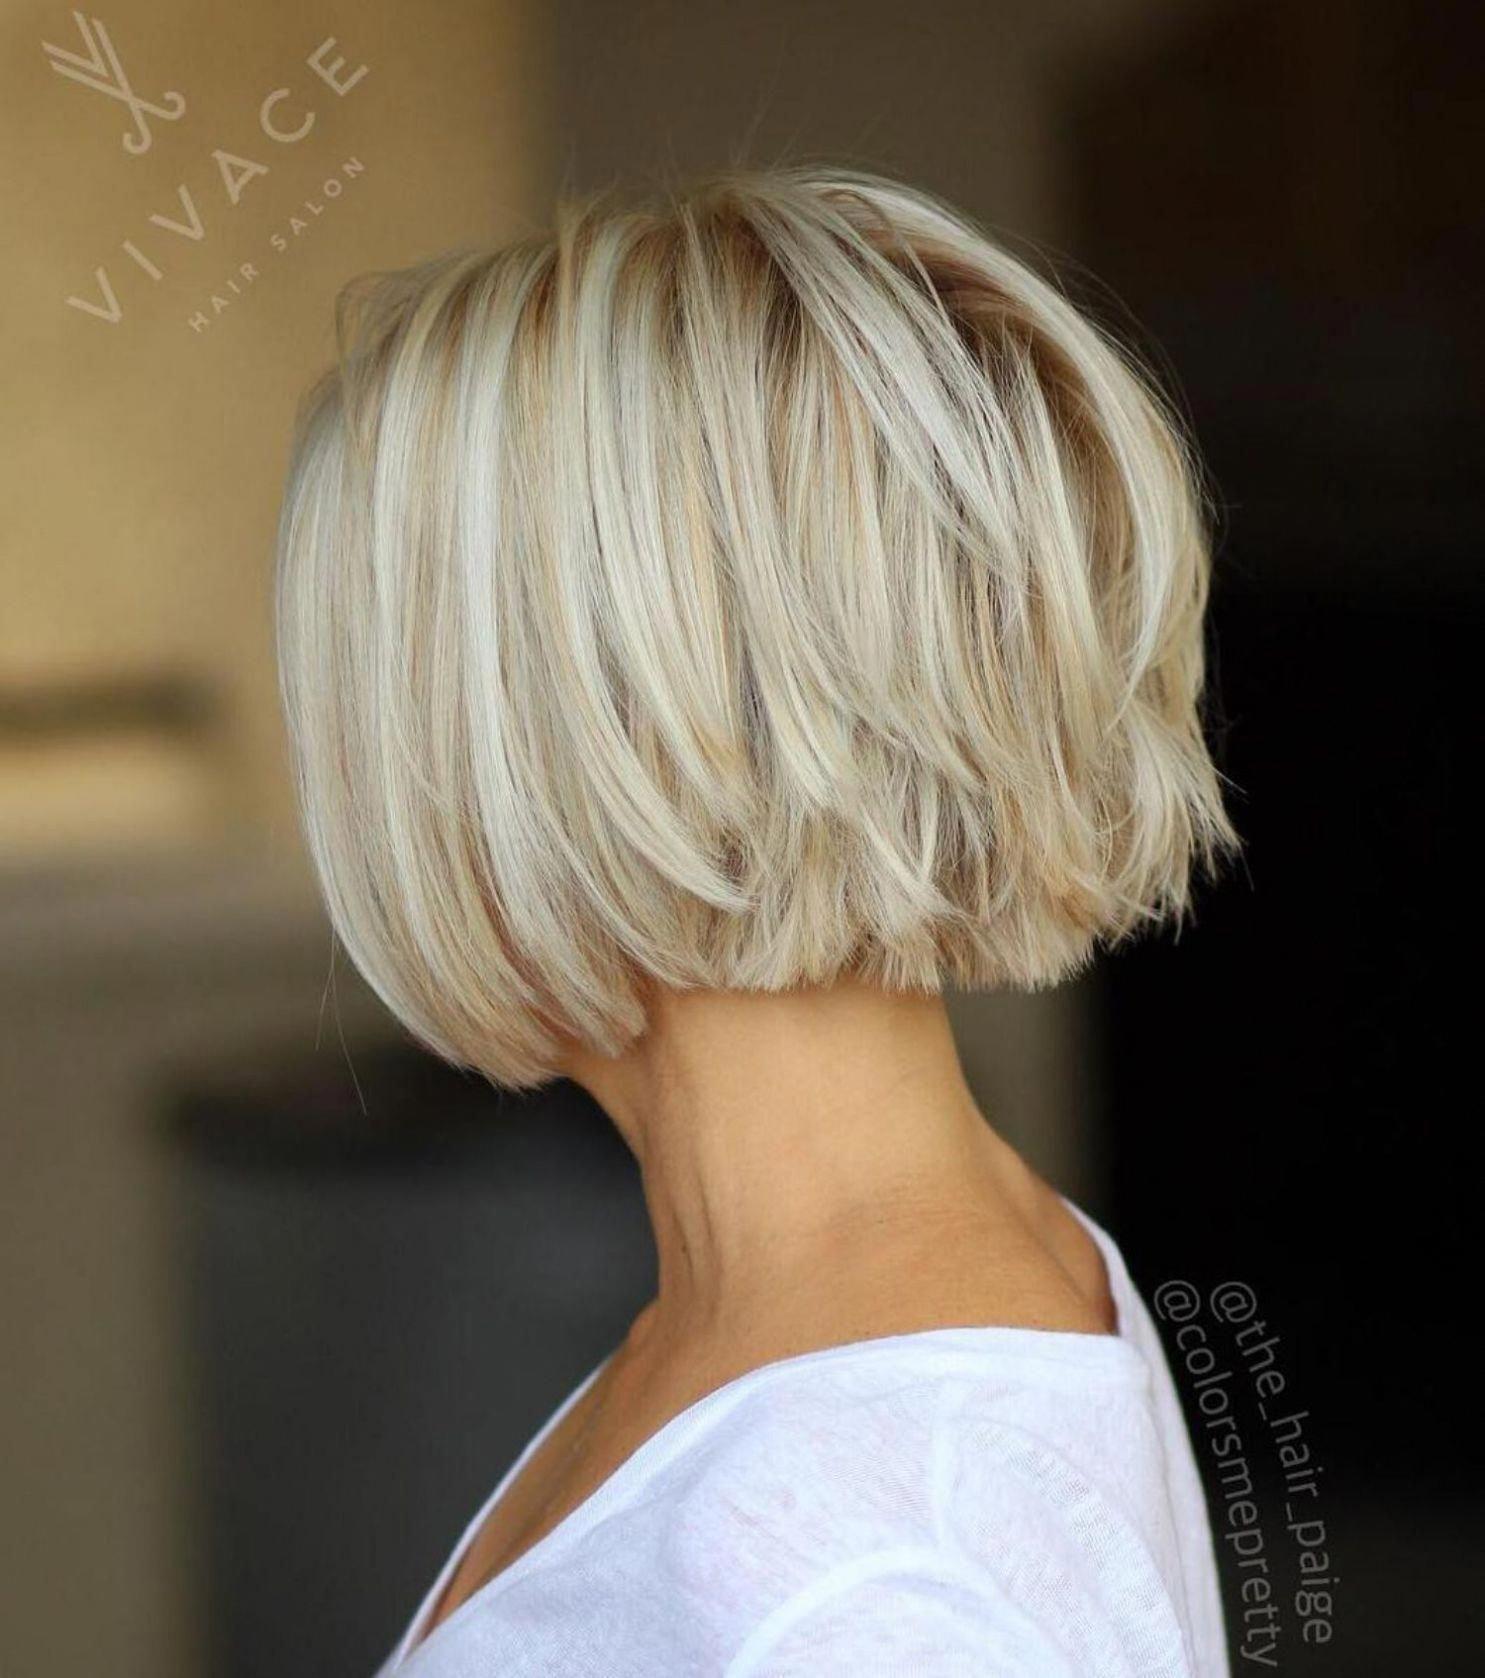 59 Choppy Piece Y Blonde Bob Bobhairstylesforfinehair Mediumbob In 2020 Short Thin Hair Hair Styles Haircuts For Fine Hair